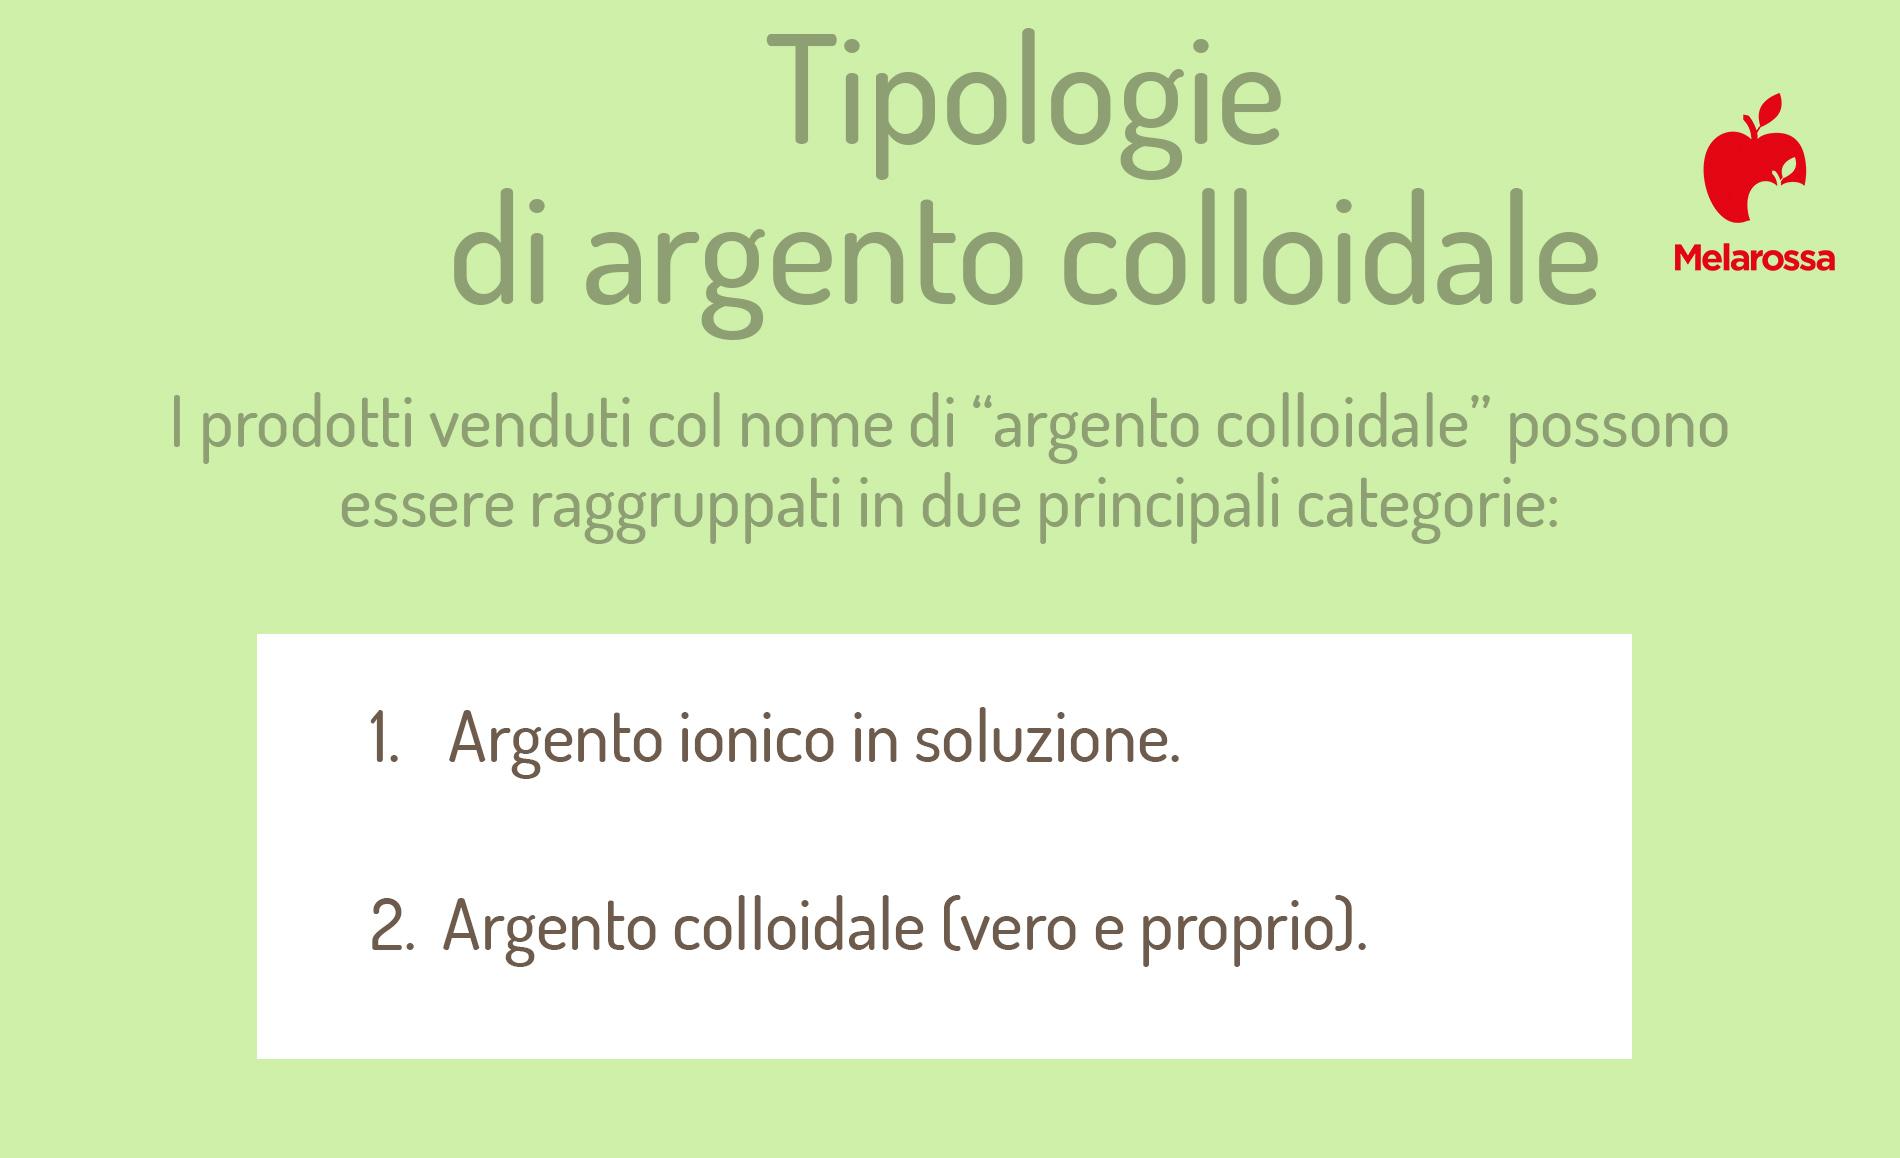 argento colloidale: tipologia